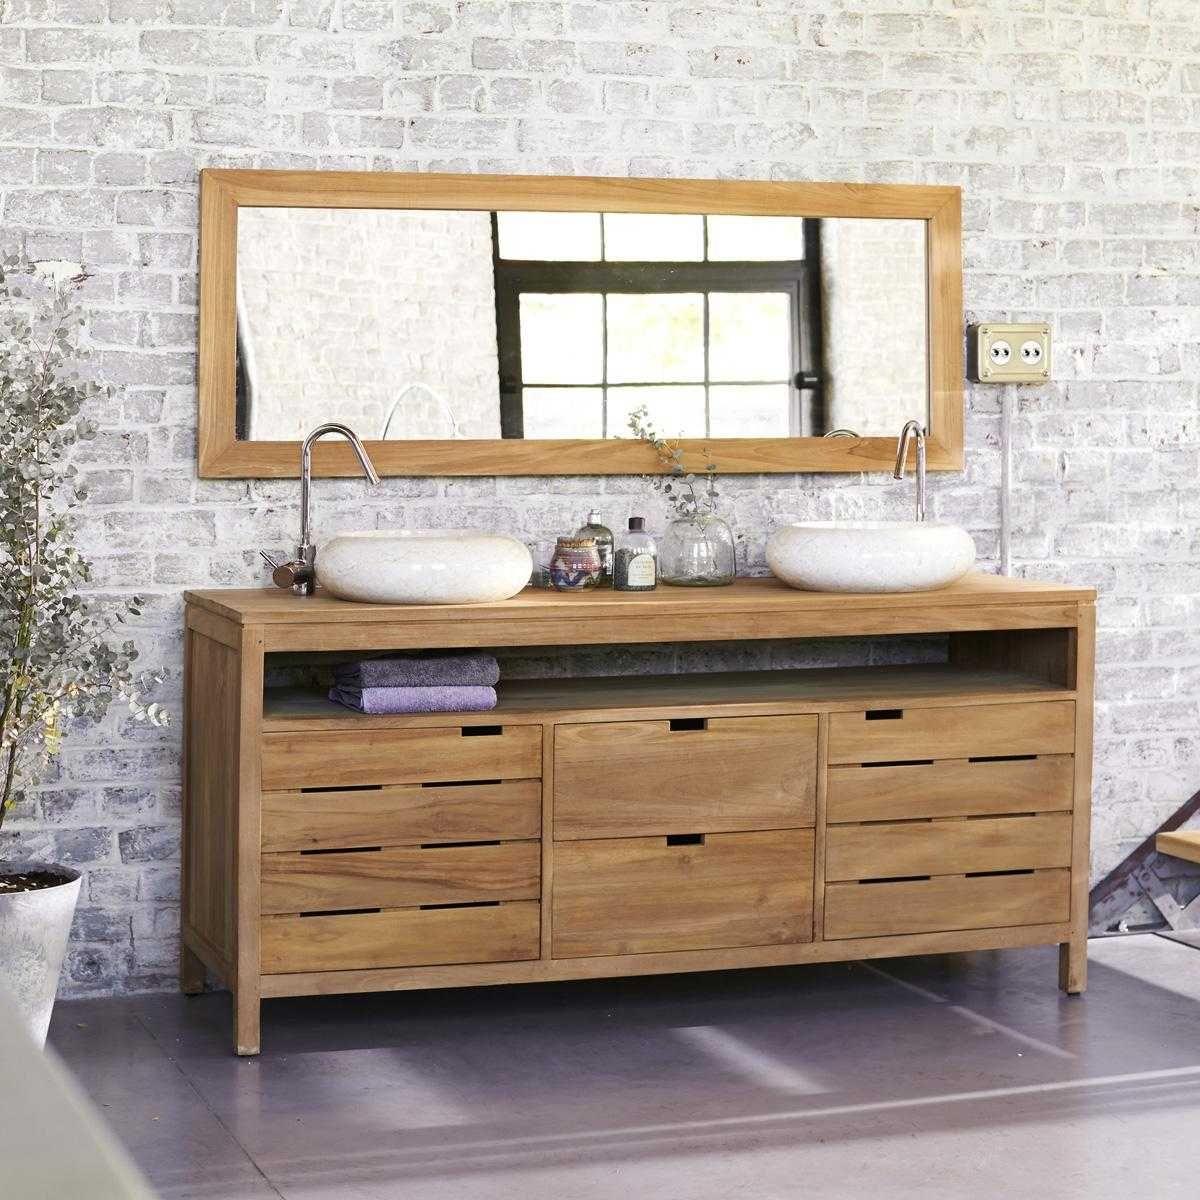 Beautiful Ikea Salle De Bains Meuble Vasques